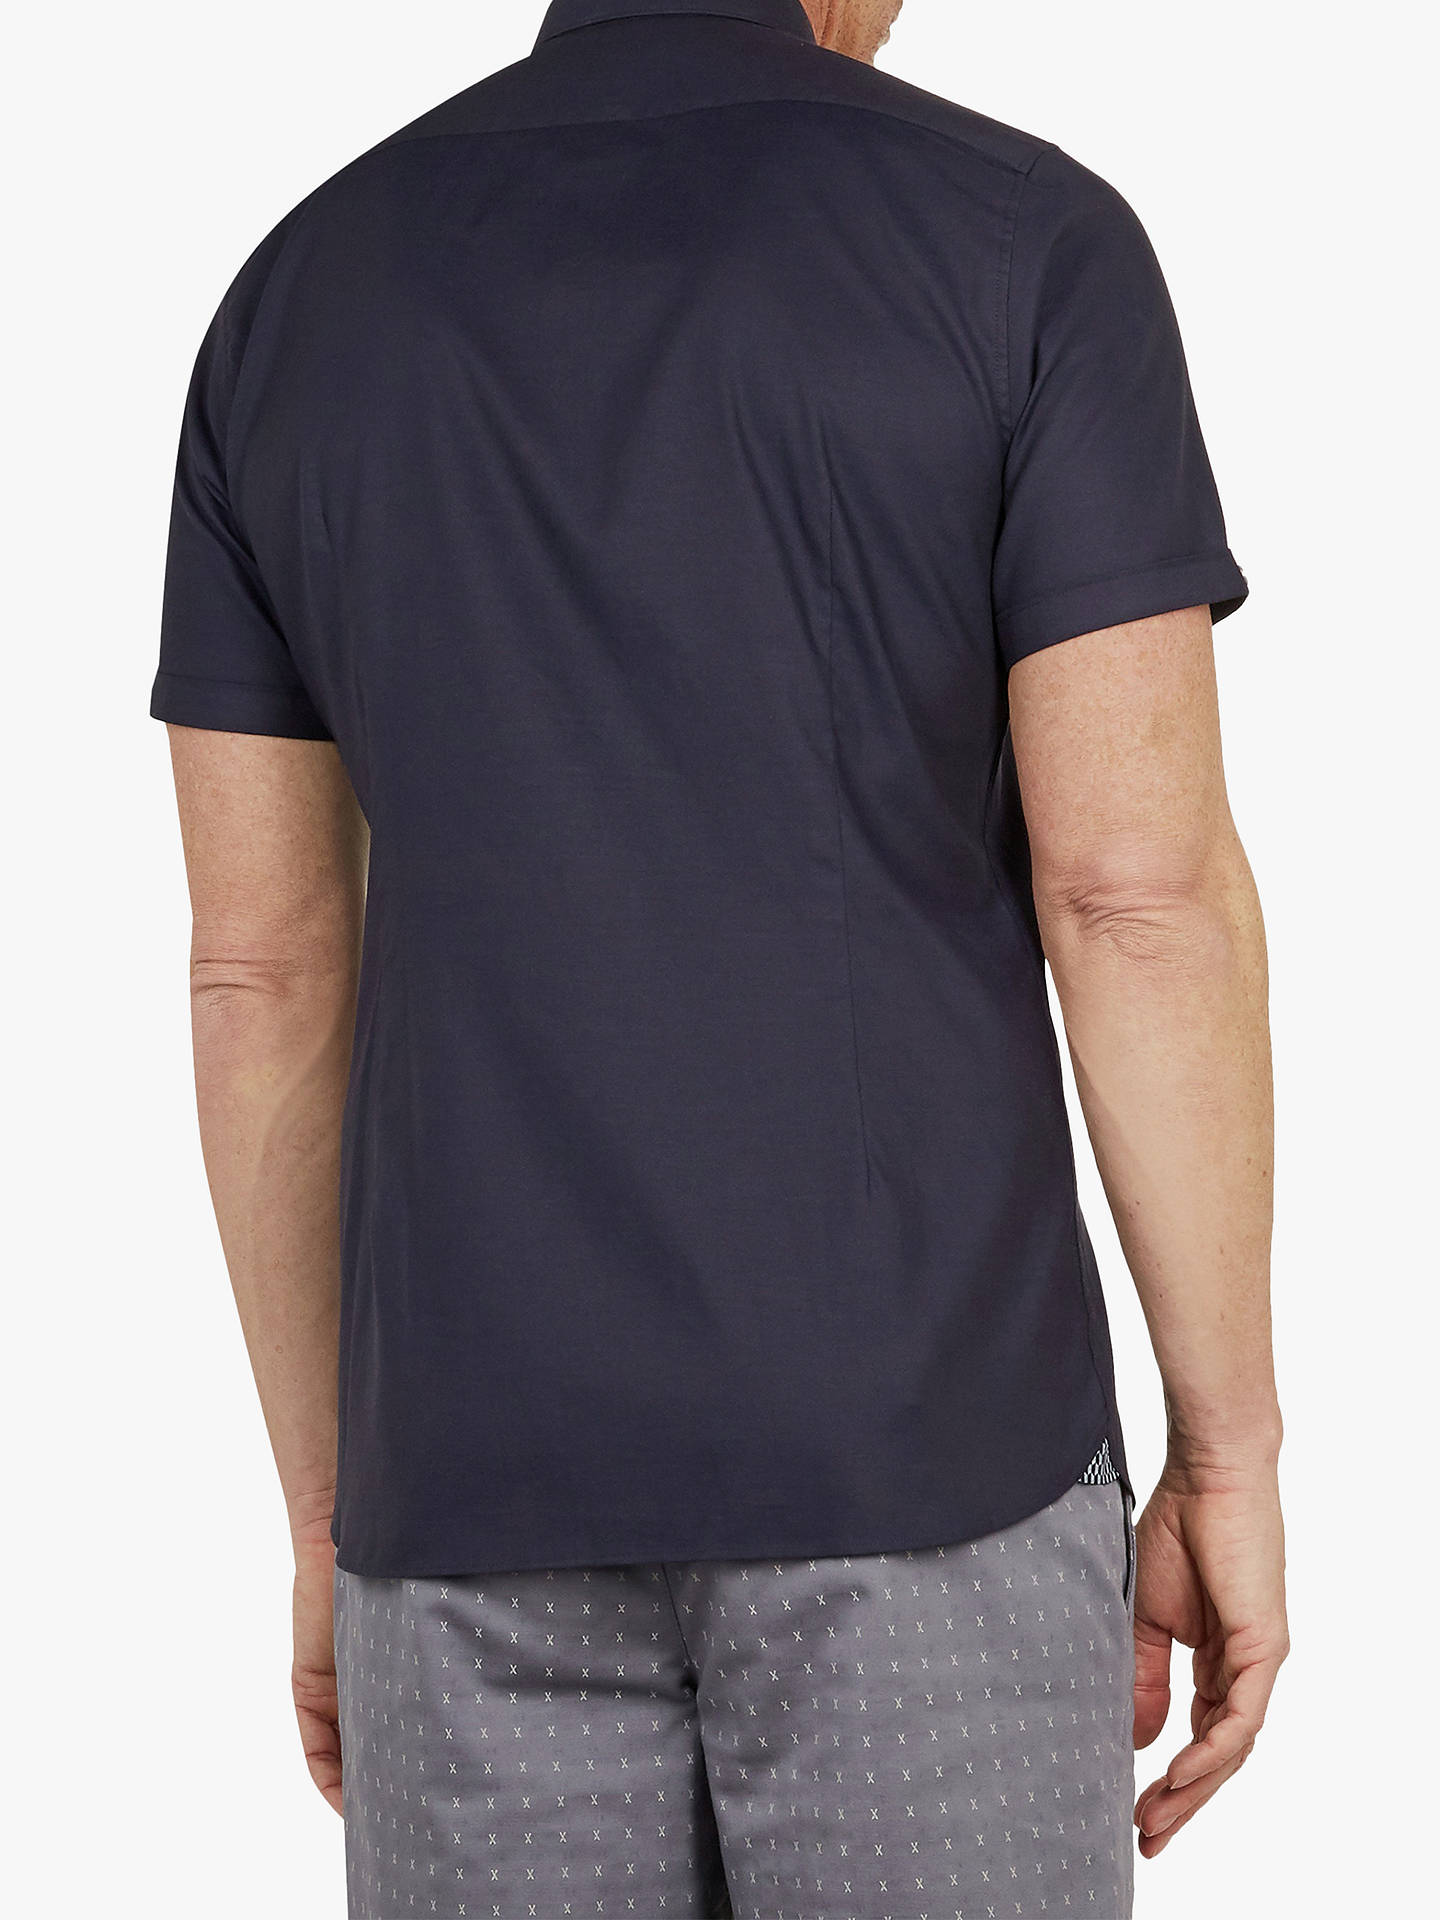 235febc7a Ted Baker T for Tall Wallatt Short Sleeve Shirt at John Lewis   Partners